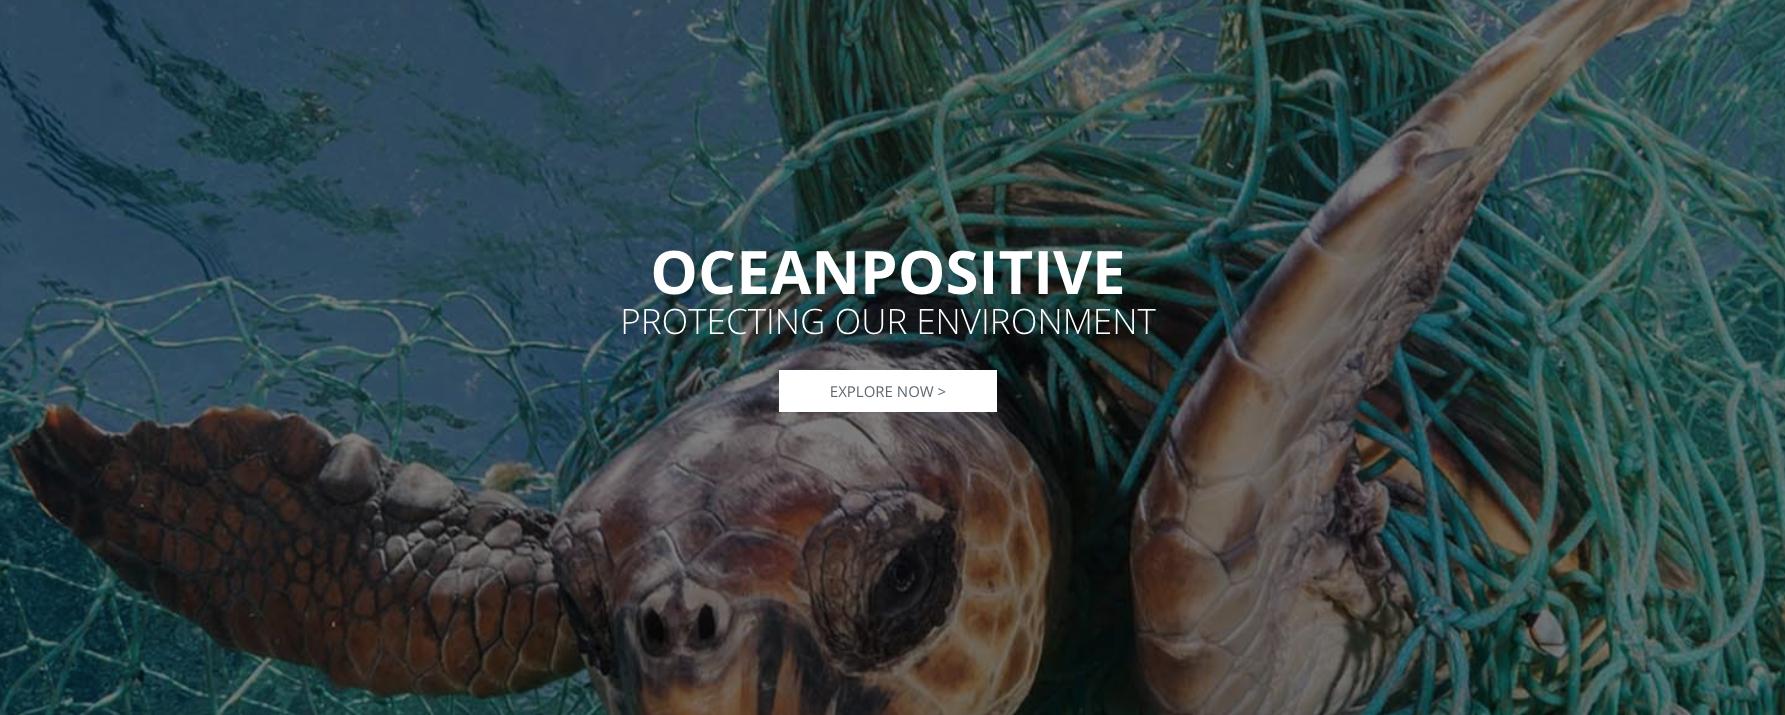 FE Ocean Positive